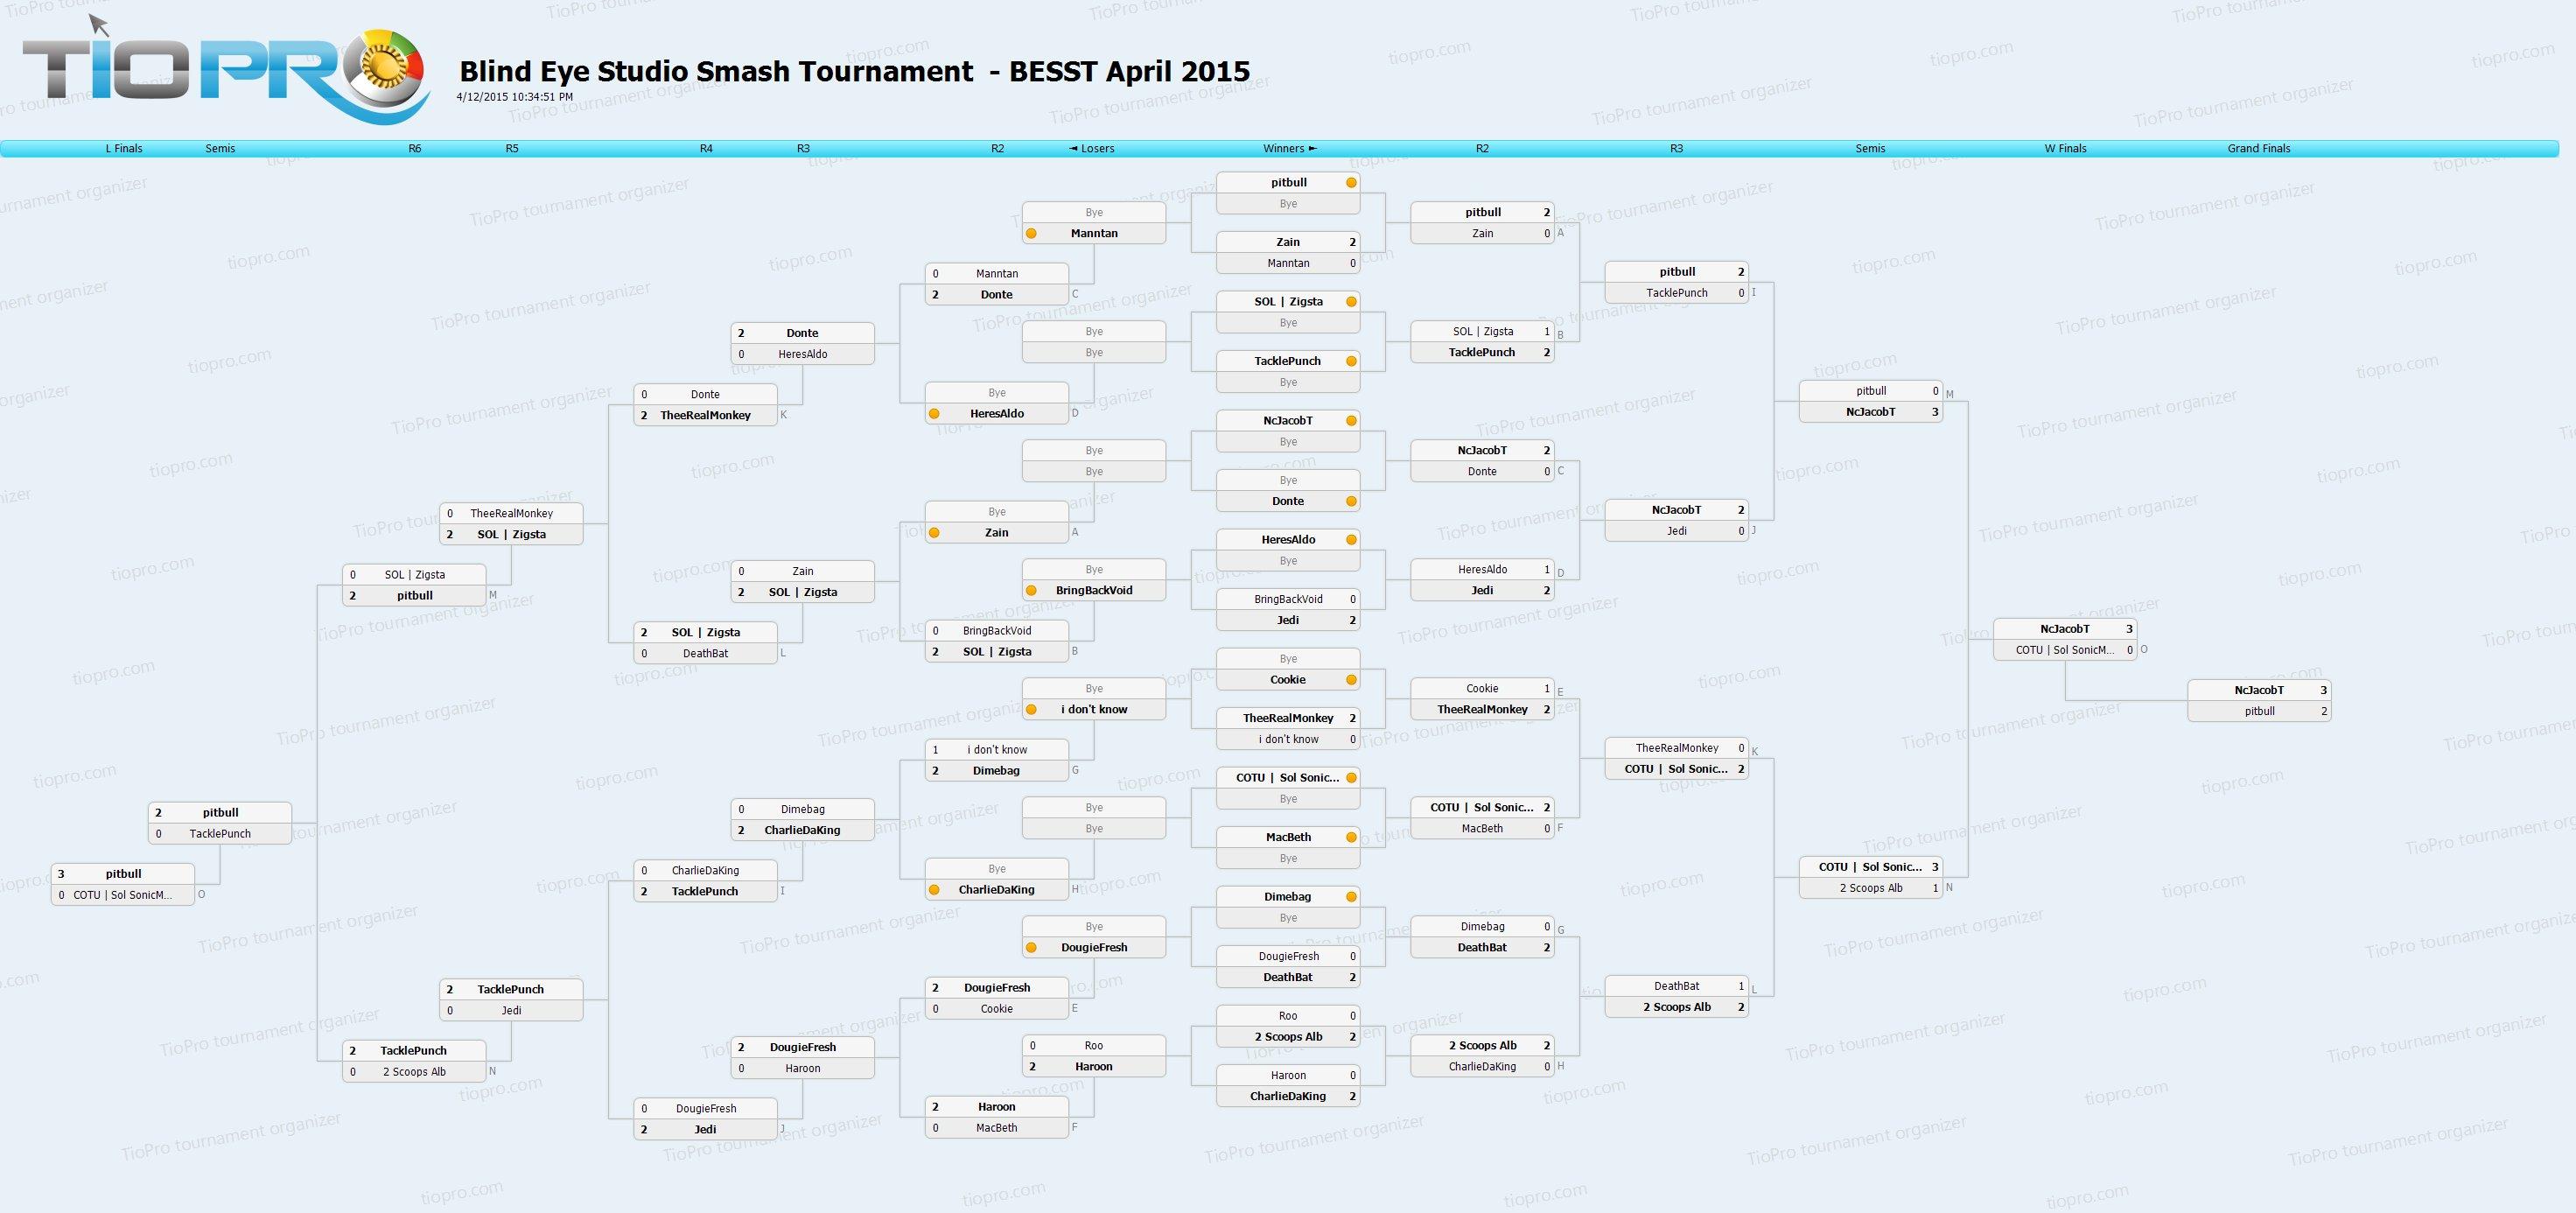 Blind Eye Studio Smash Tournament (BESST) April 2015